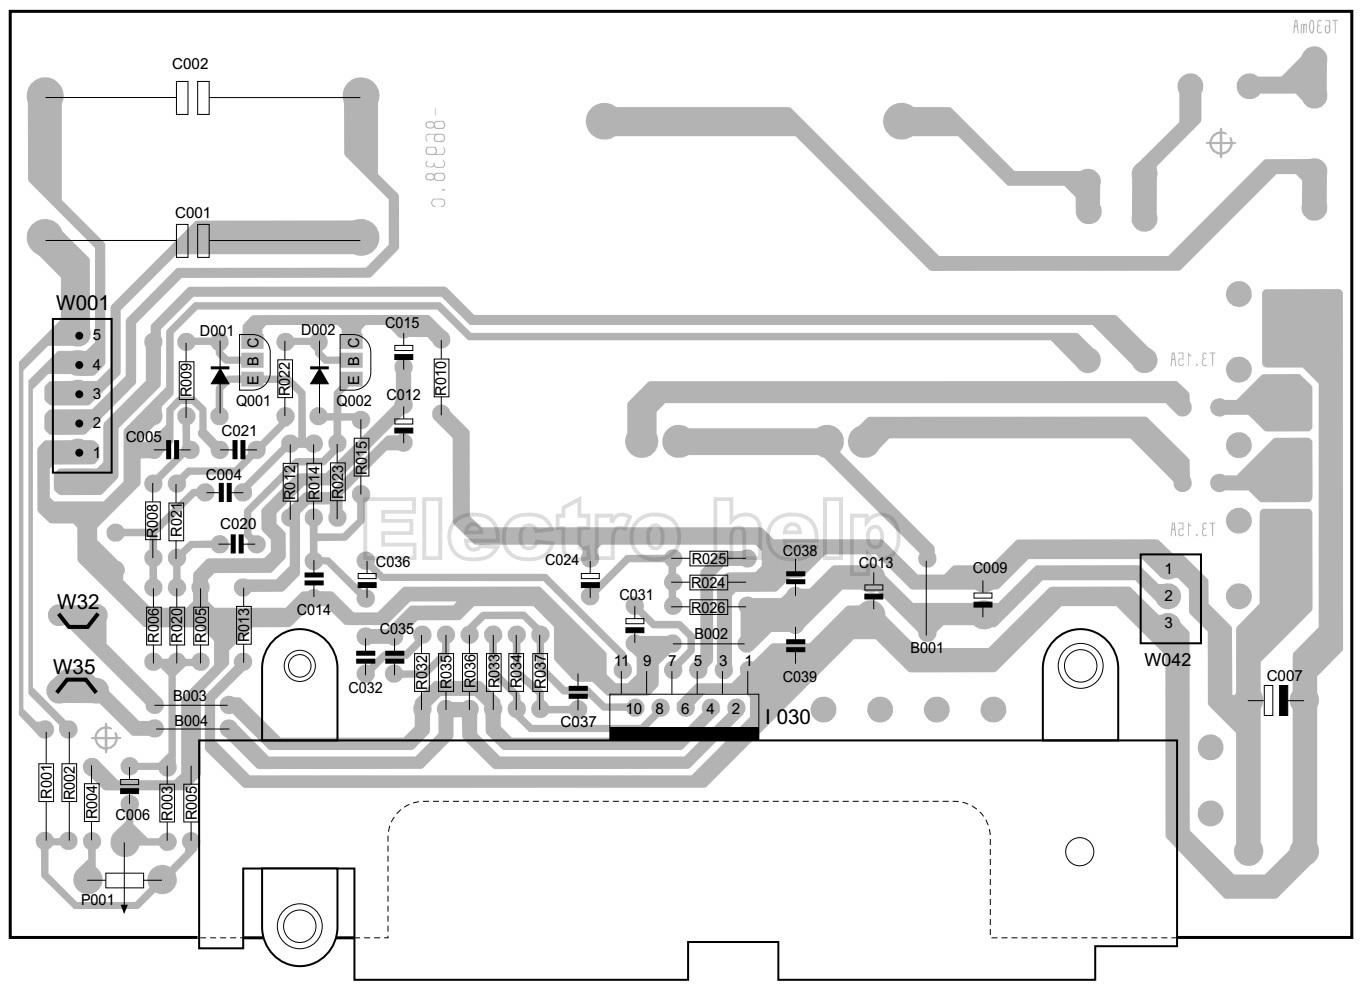 Car Sub Wiring Diagram Danfoss Oil Pressure Control 22 Watt Subwoofer Amplifier Circuit